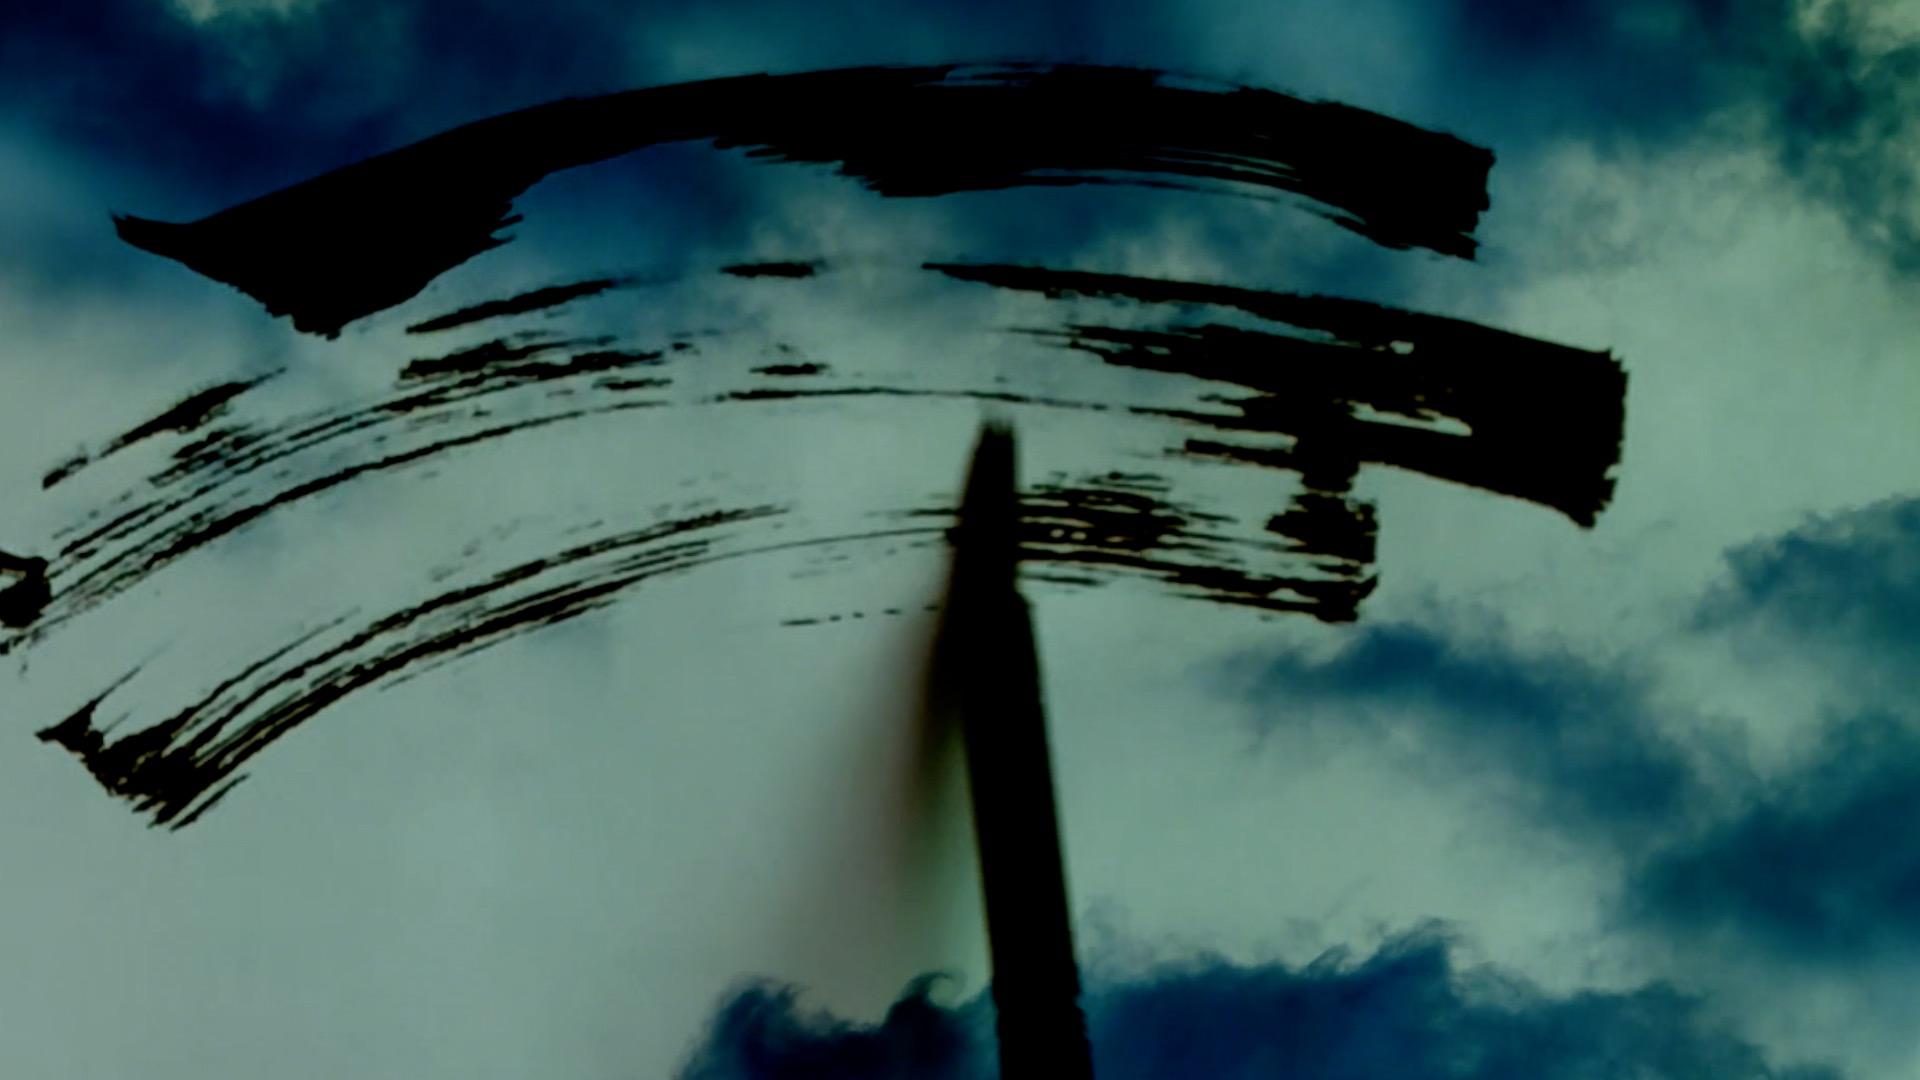 Heaven - I. Clouds